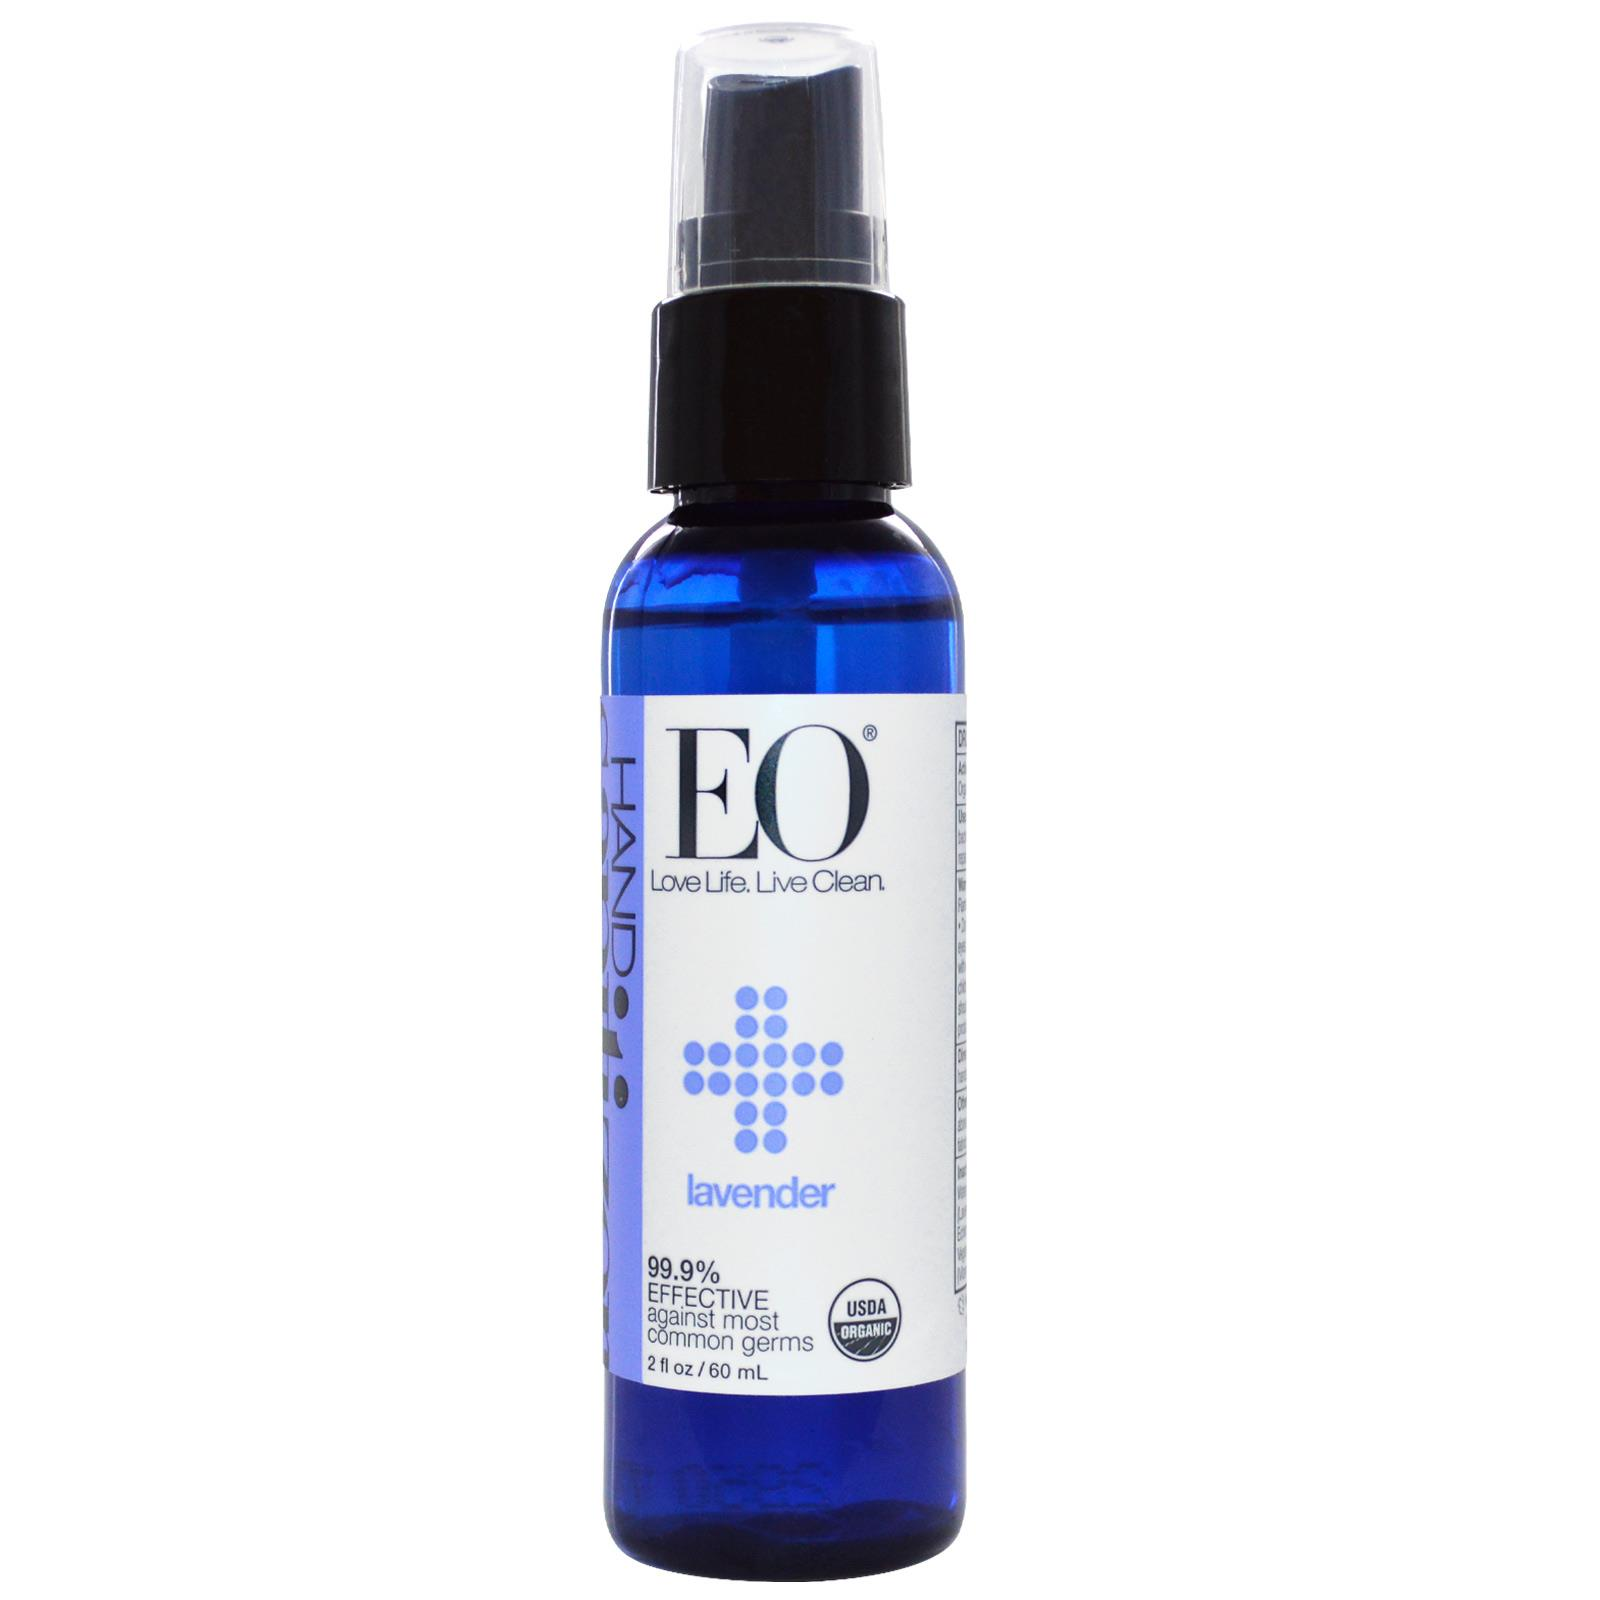 Eo Hand Sanitizer Spry Lavendar (6x2oz )